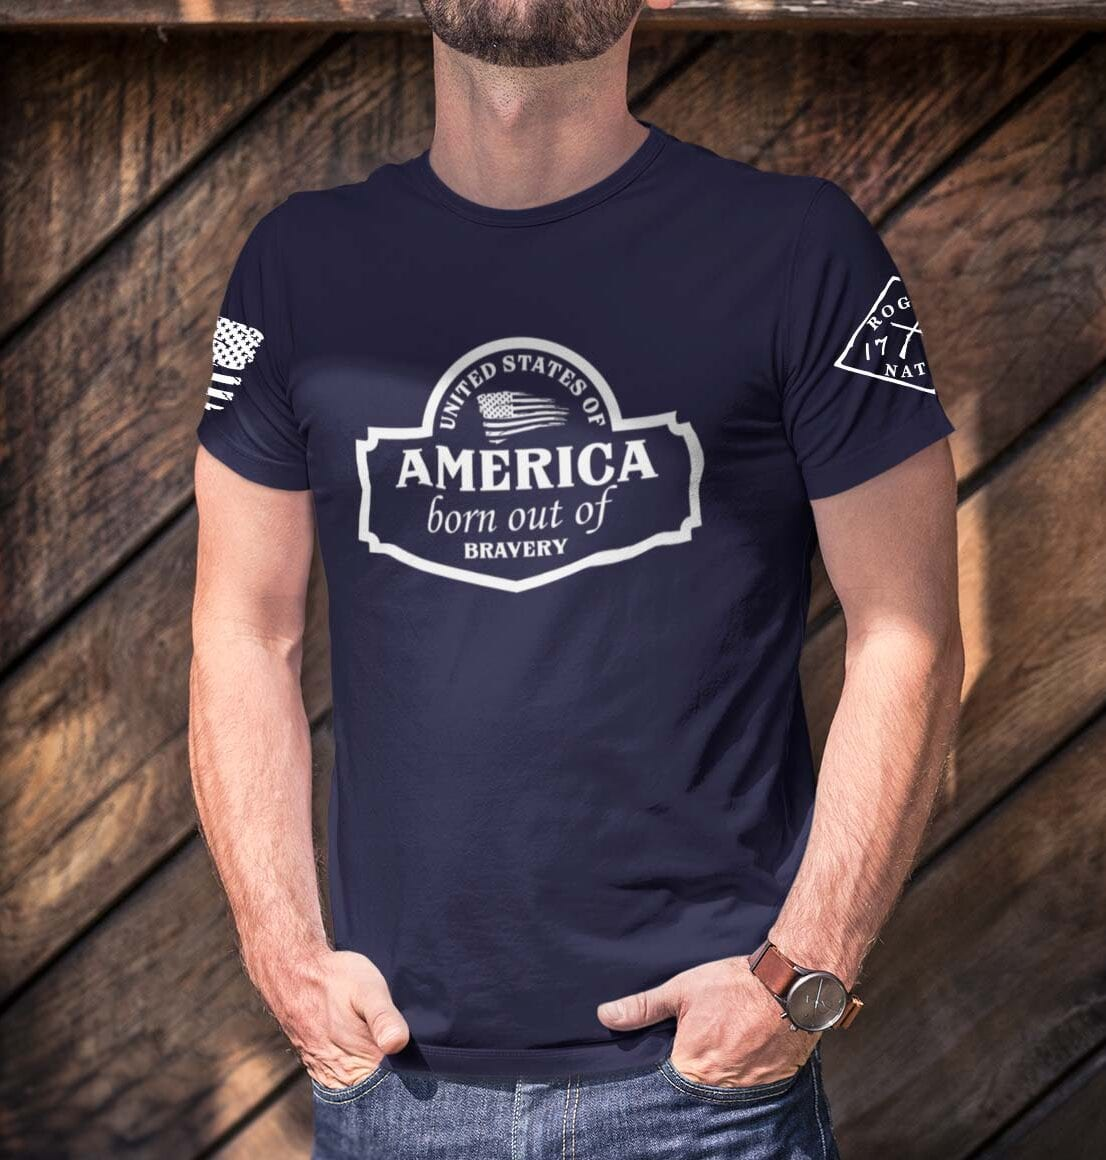 September Club Shirt on Men's Navy Blue T-Shirt